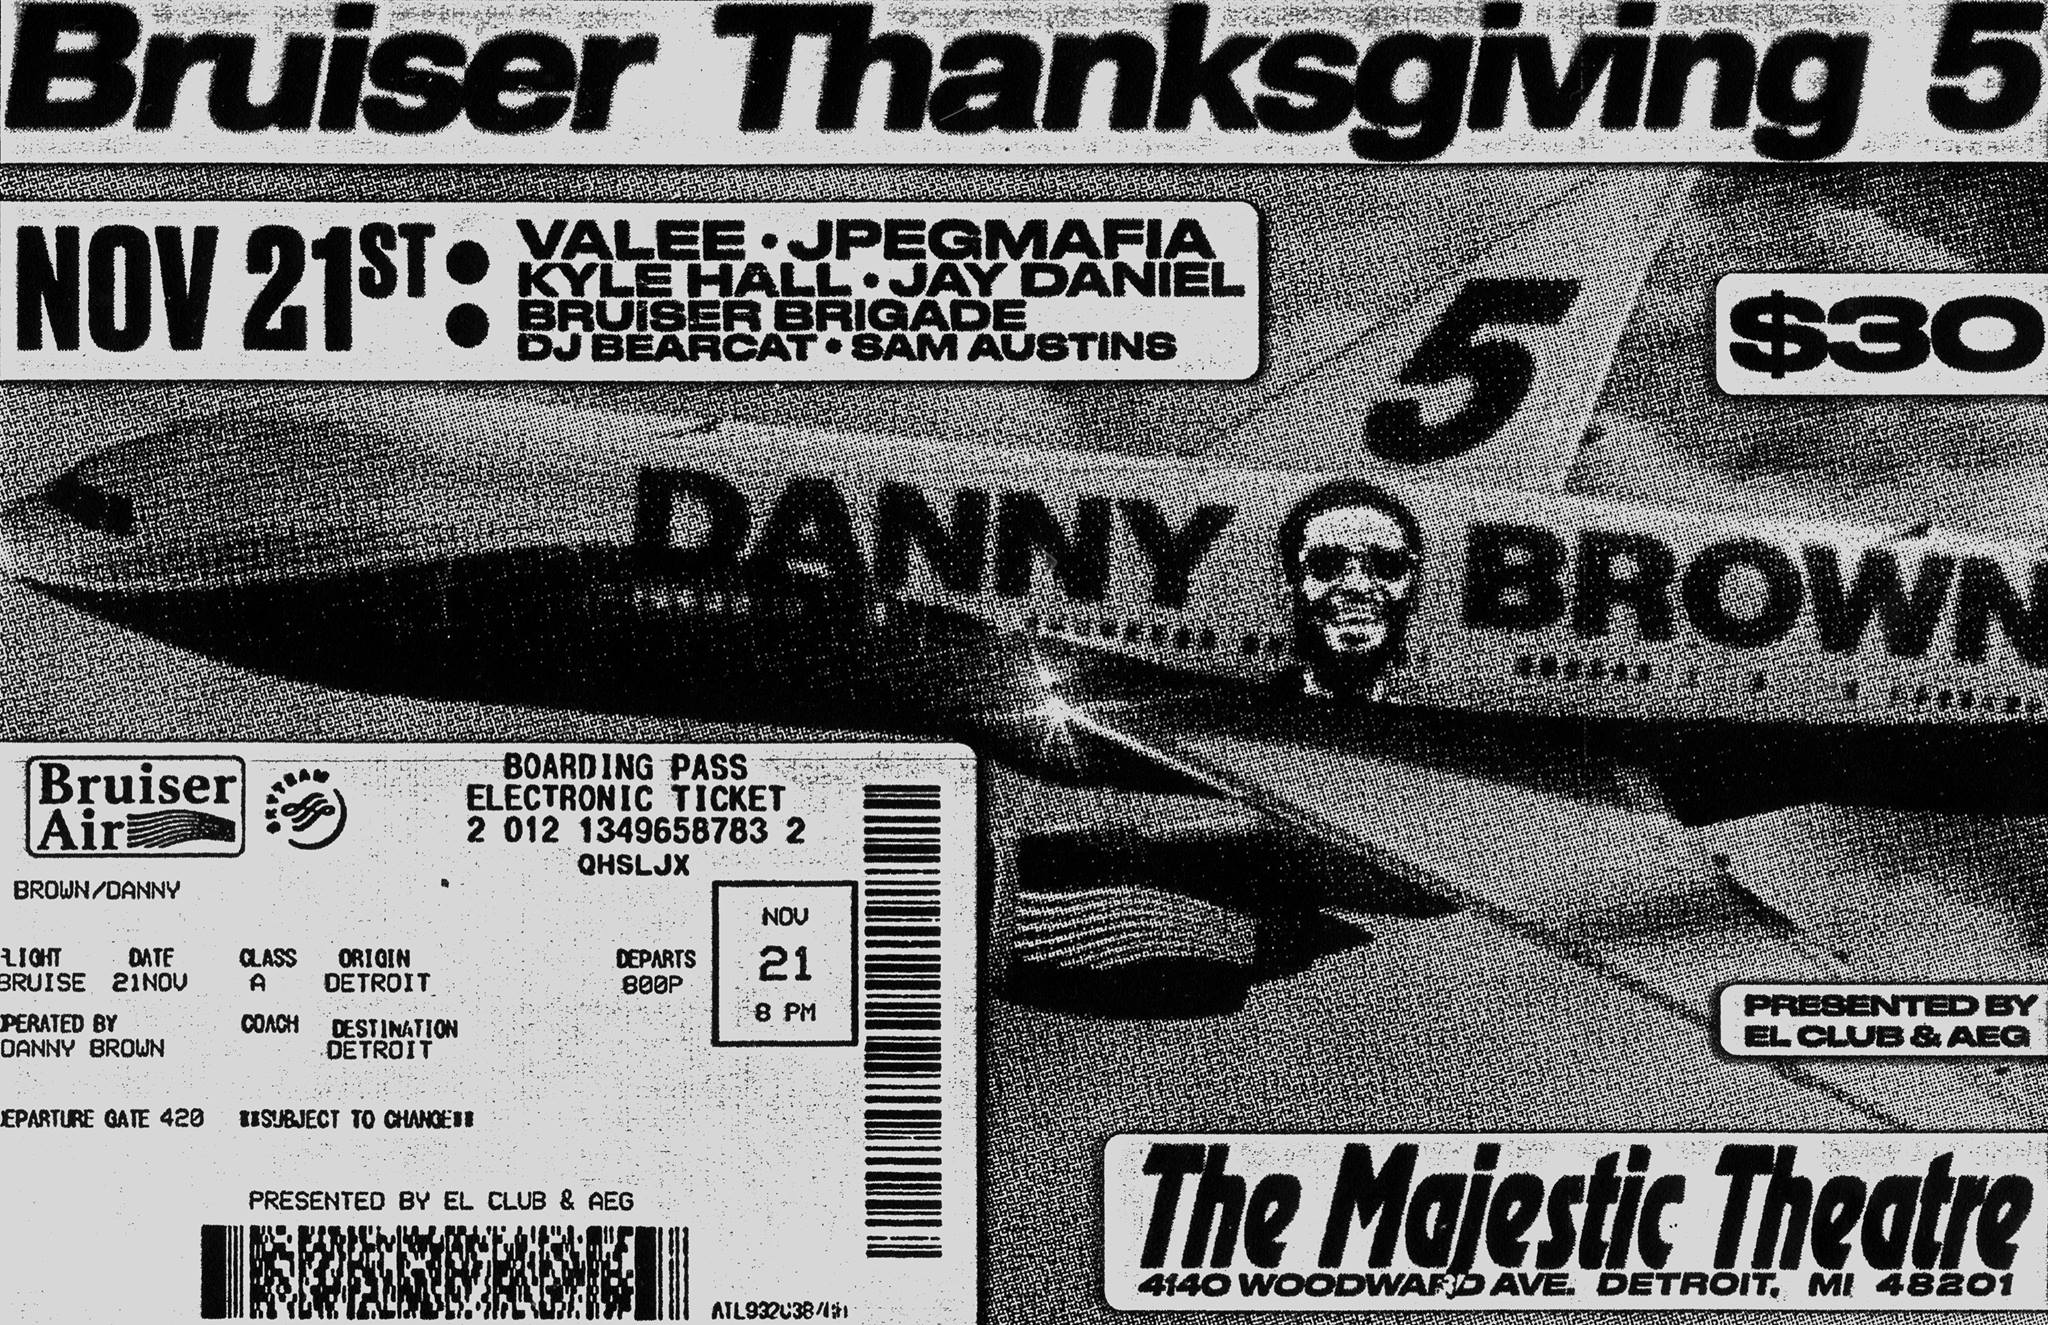 Flyer via  Danny Brown's Bruiser Thanksgiving V at The Majestic 11/21  on Facebook